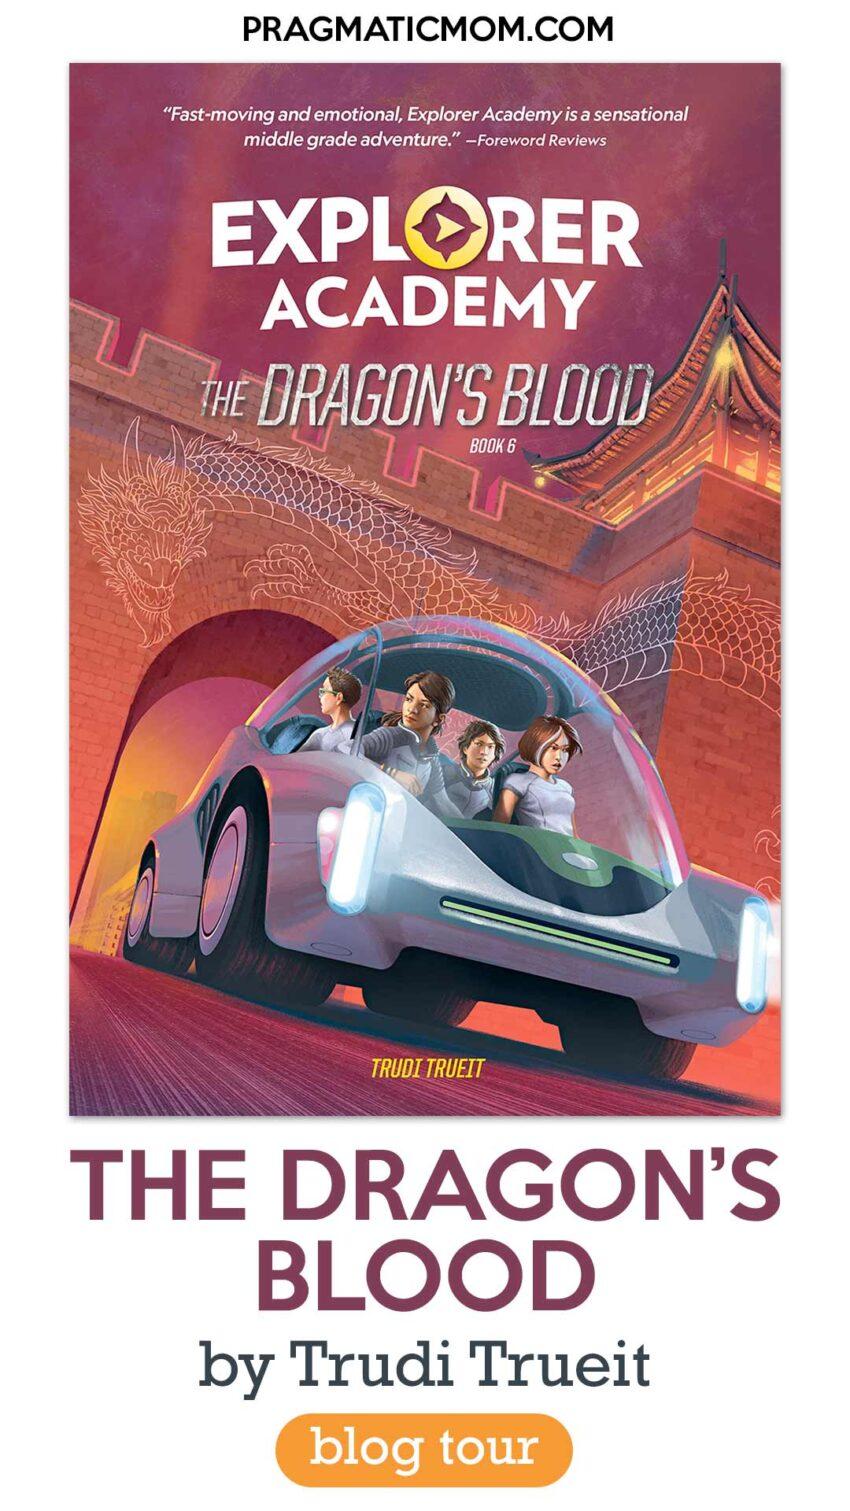 The Dragon's Blood Blog Tour